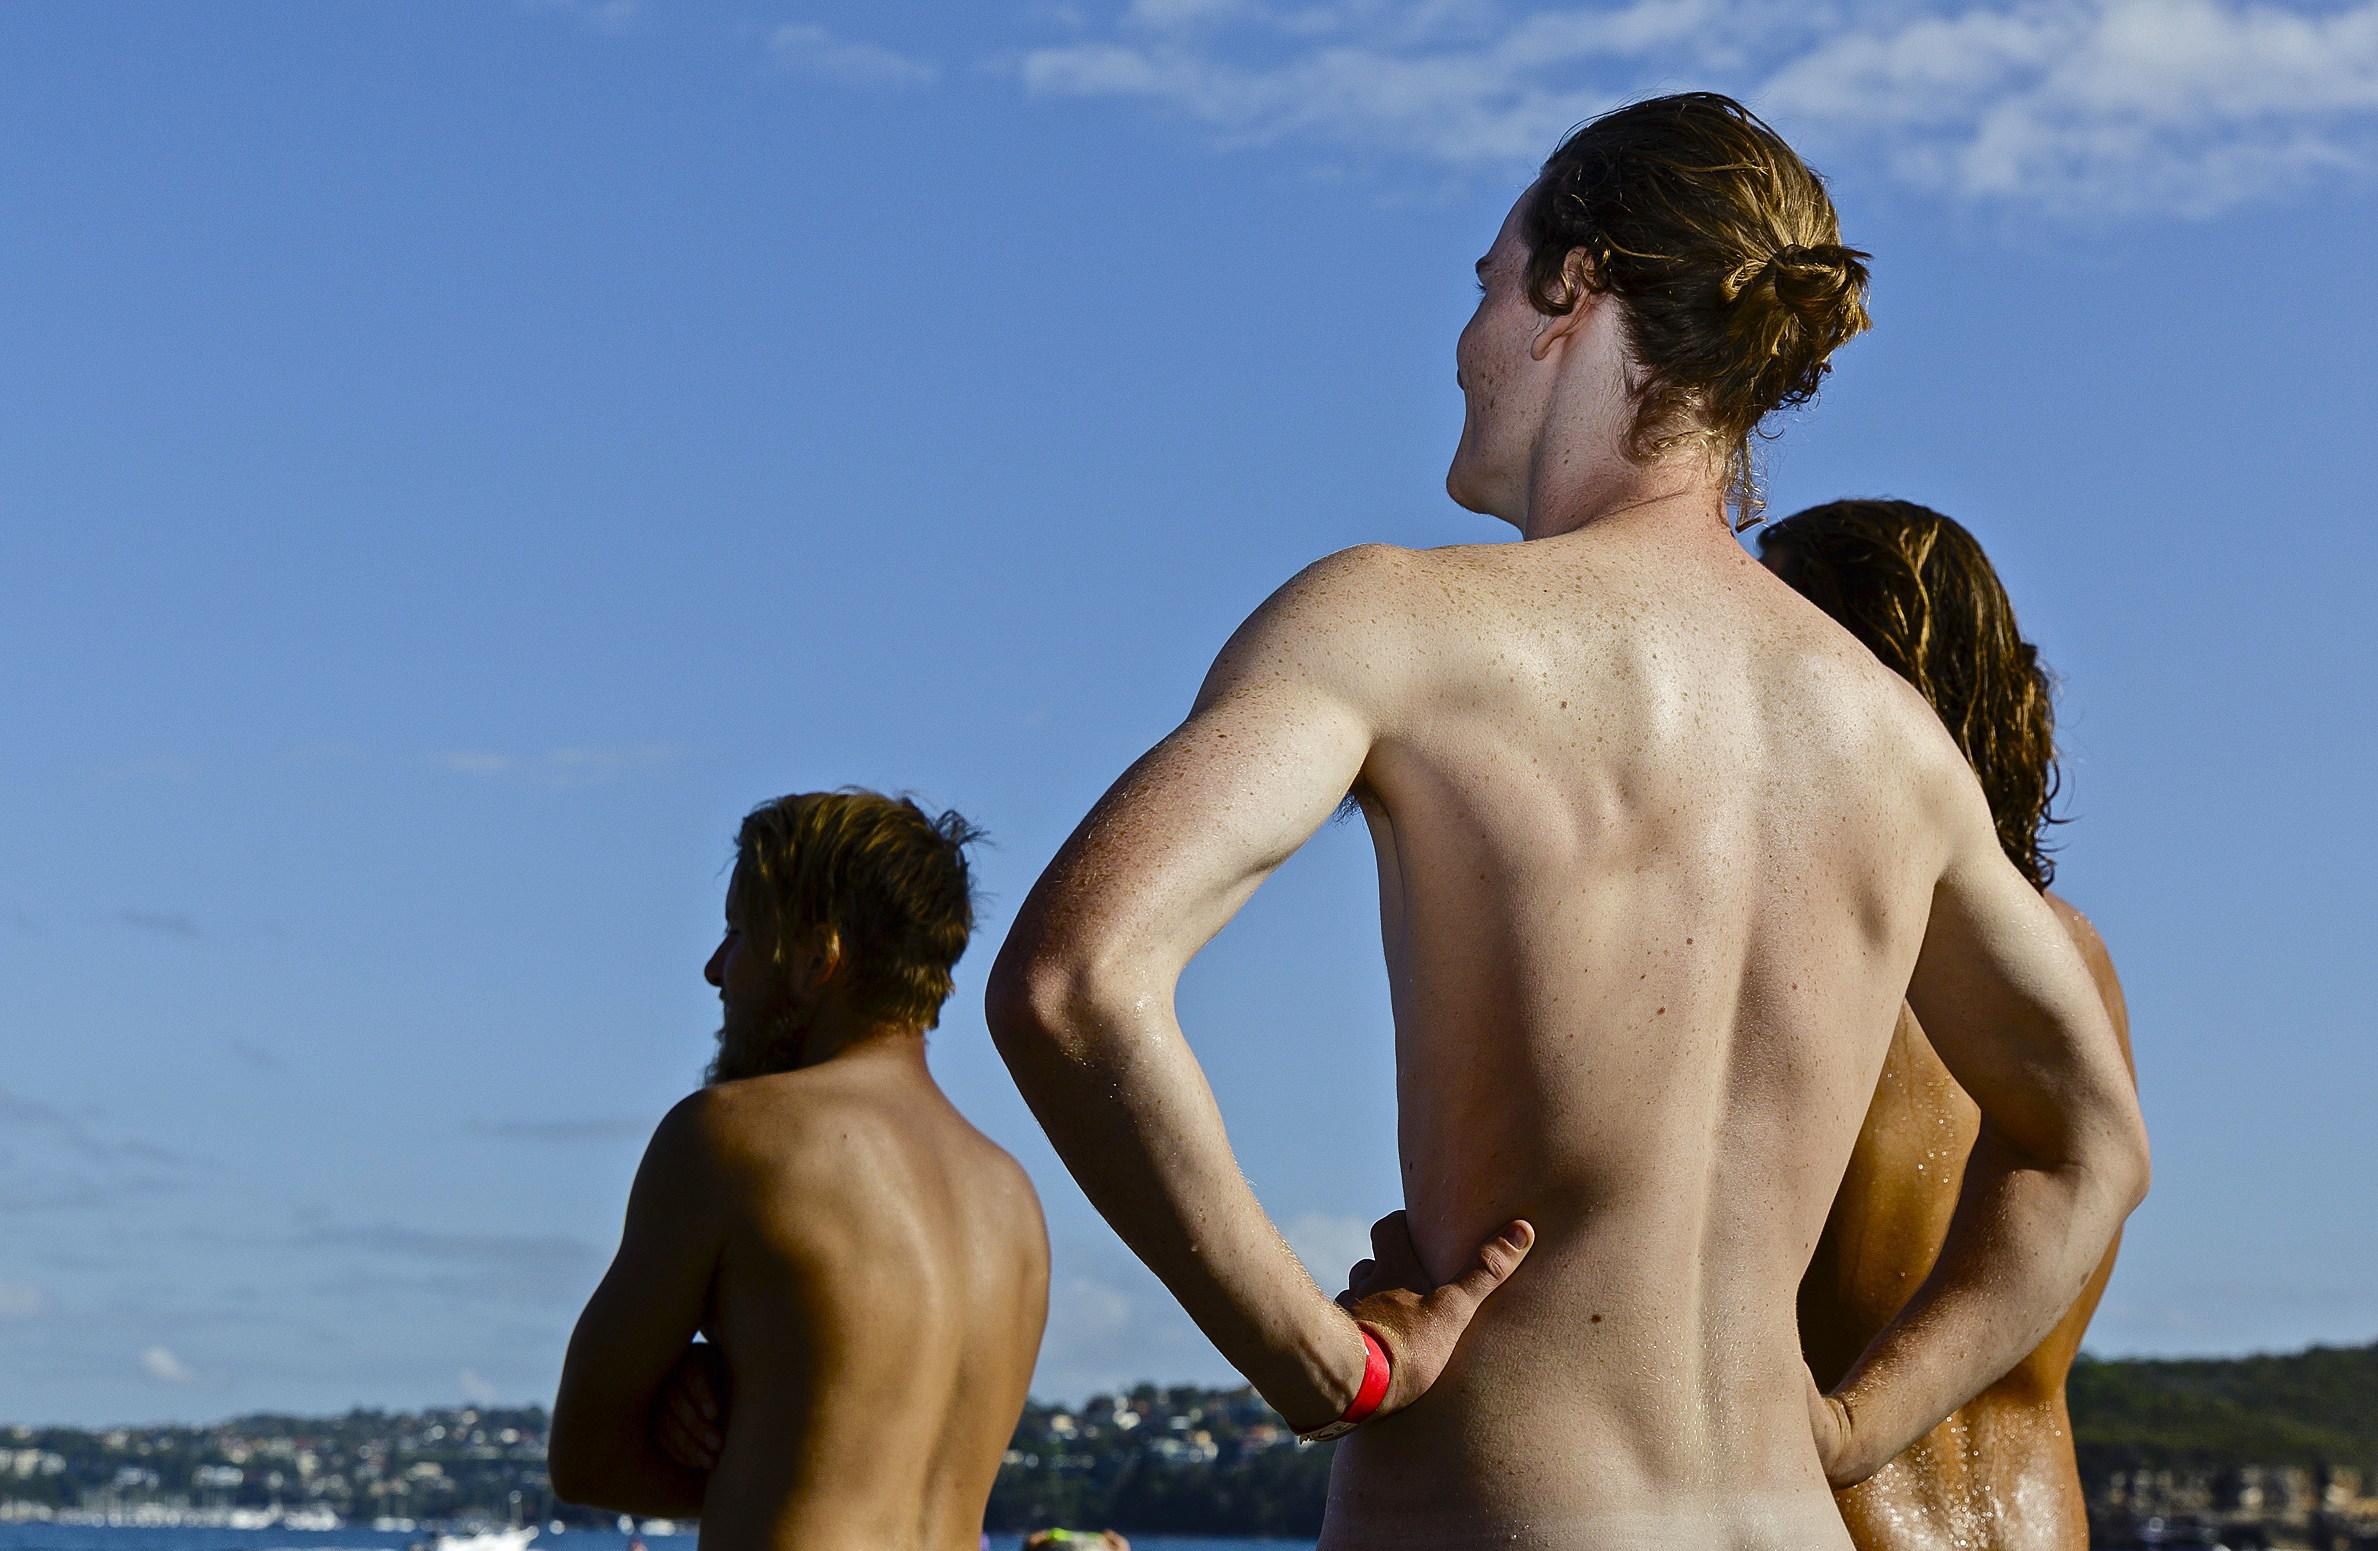 New england nudist resorts